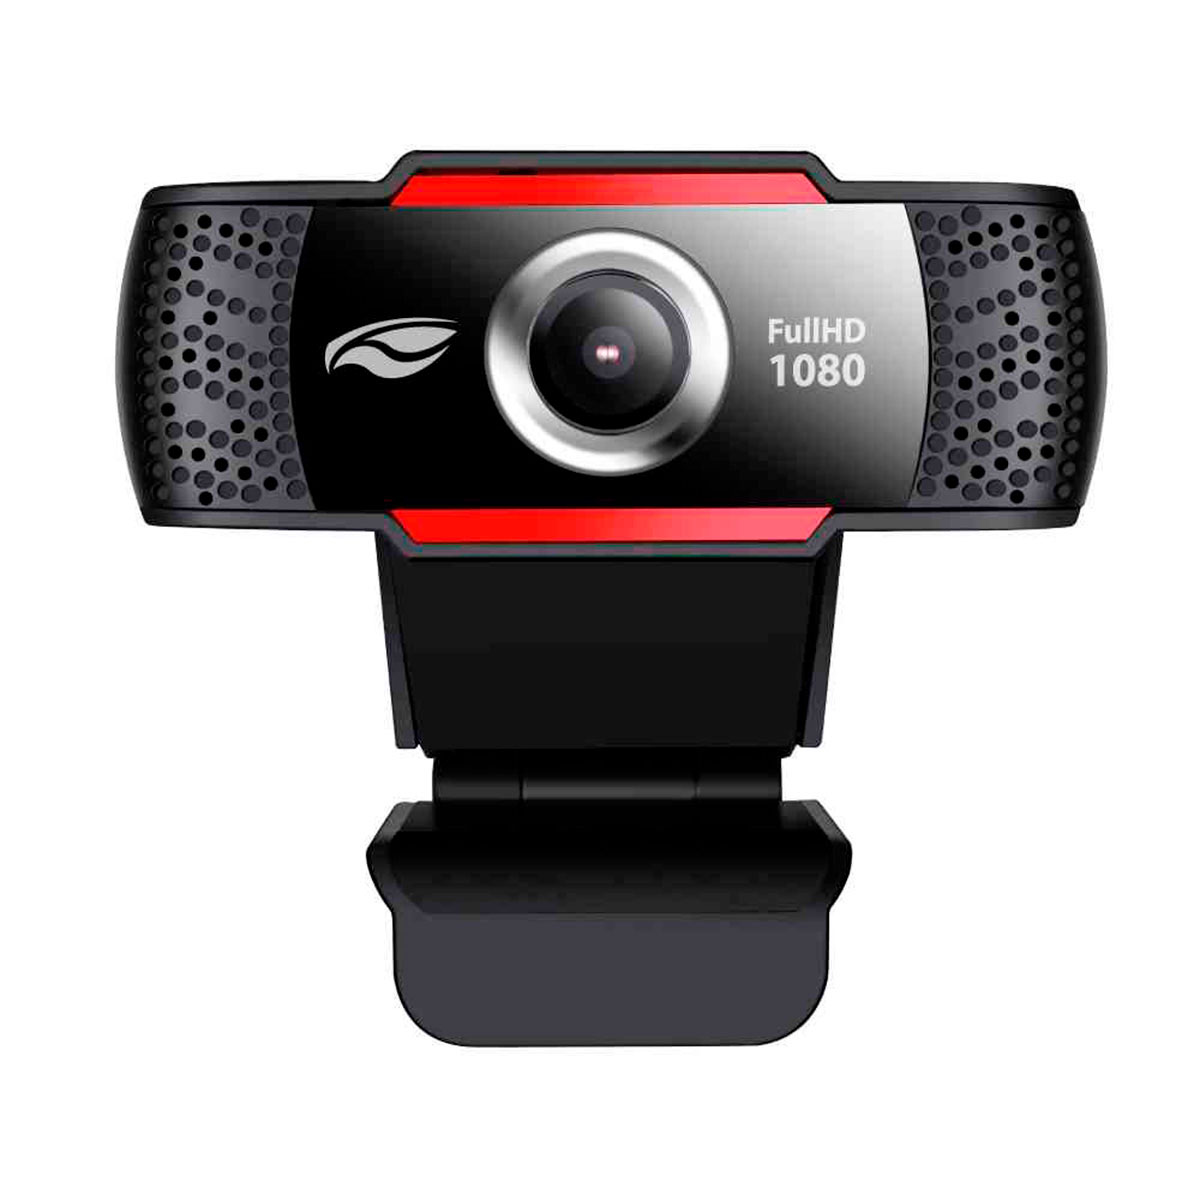 WebCam C3Tech WB-100BK, Resolução Full HD 1080p, USB 2.0, 2 MP, 30 FPS, Microfone Embutido